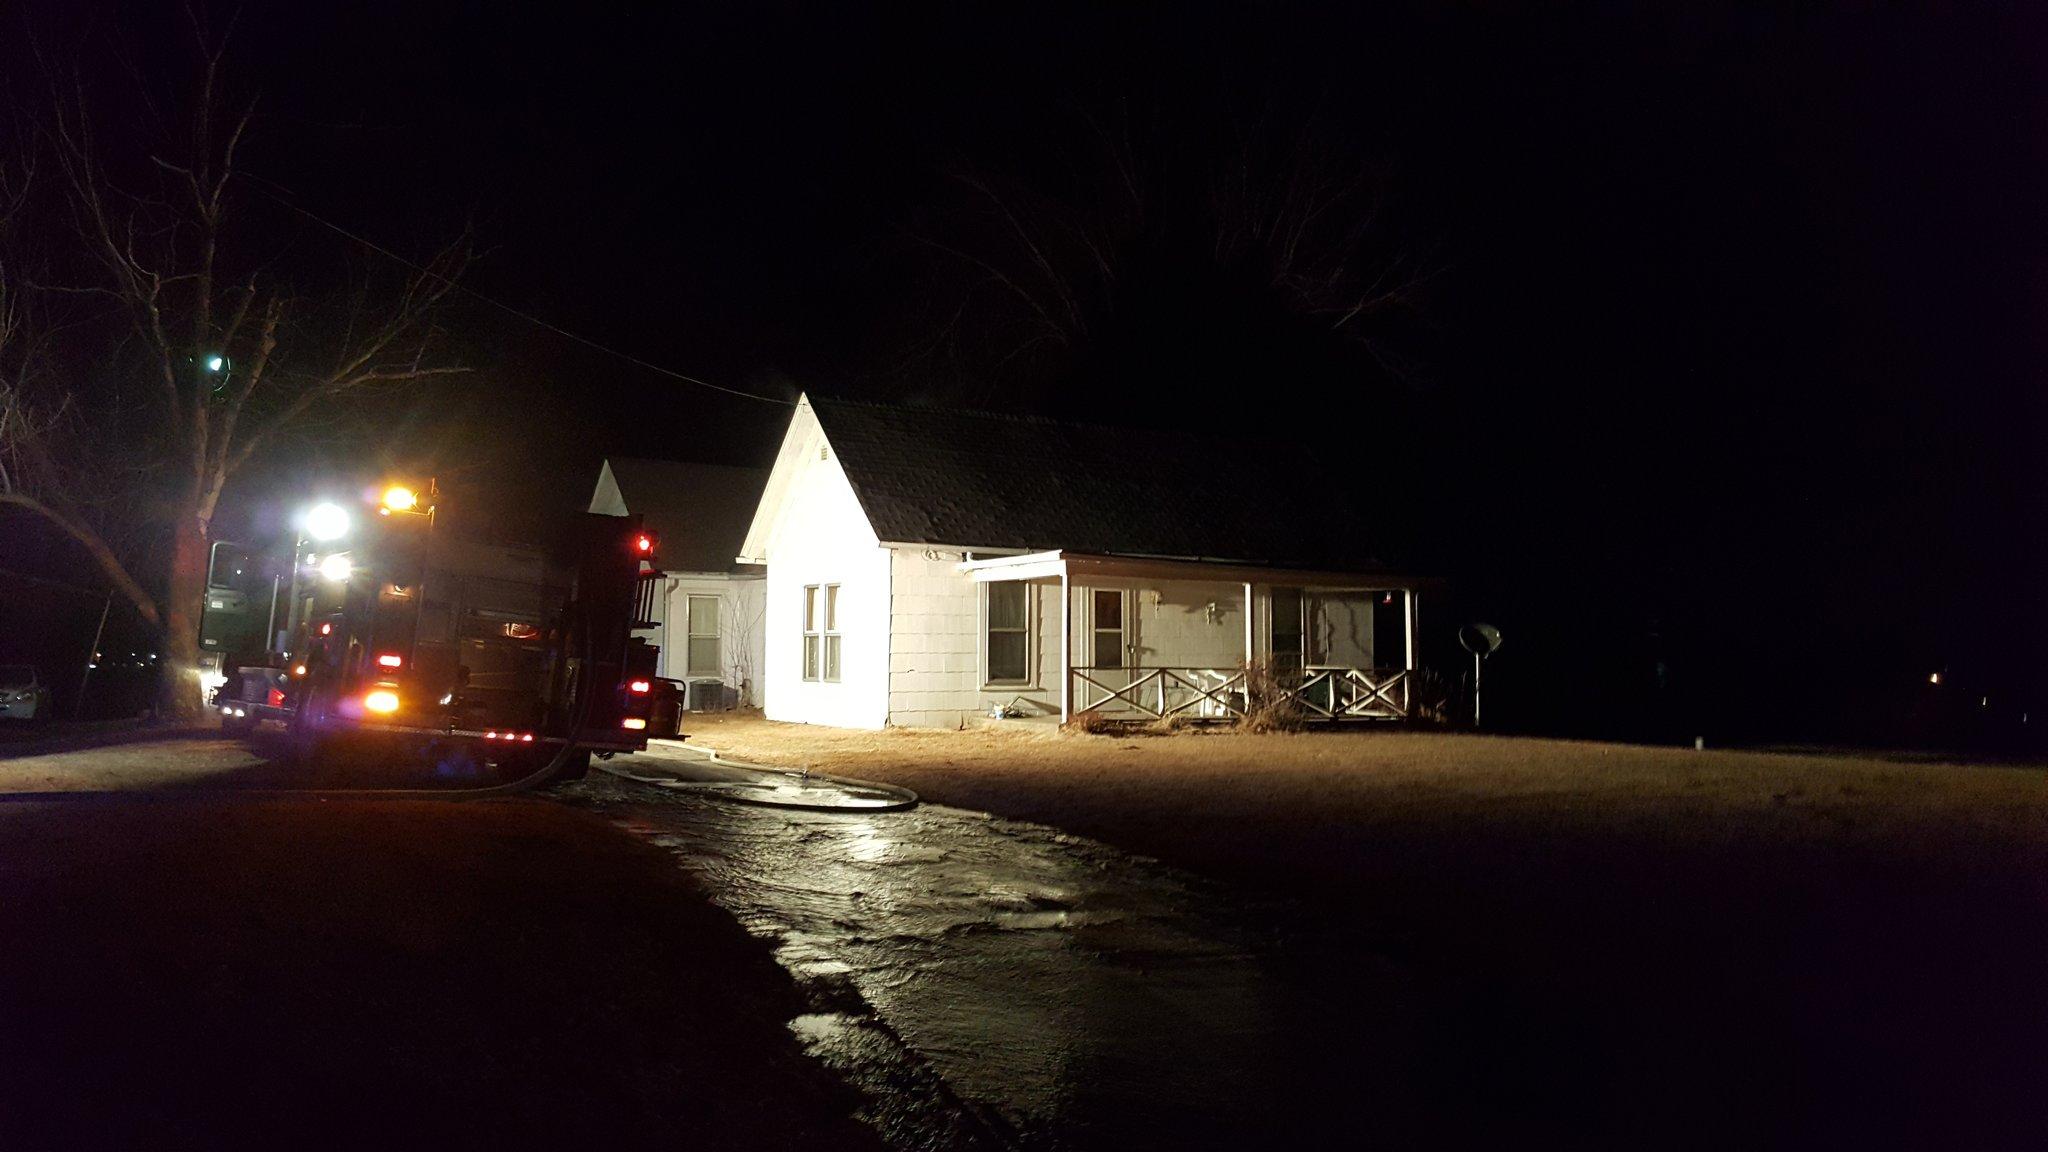 Hannibal house fire